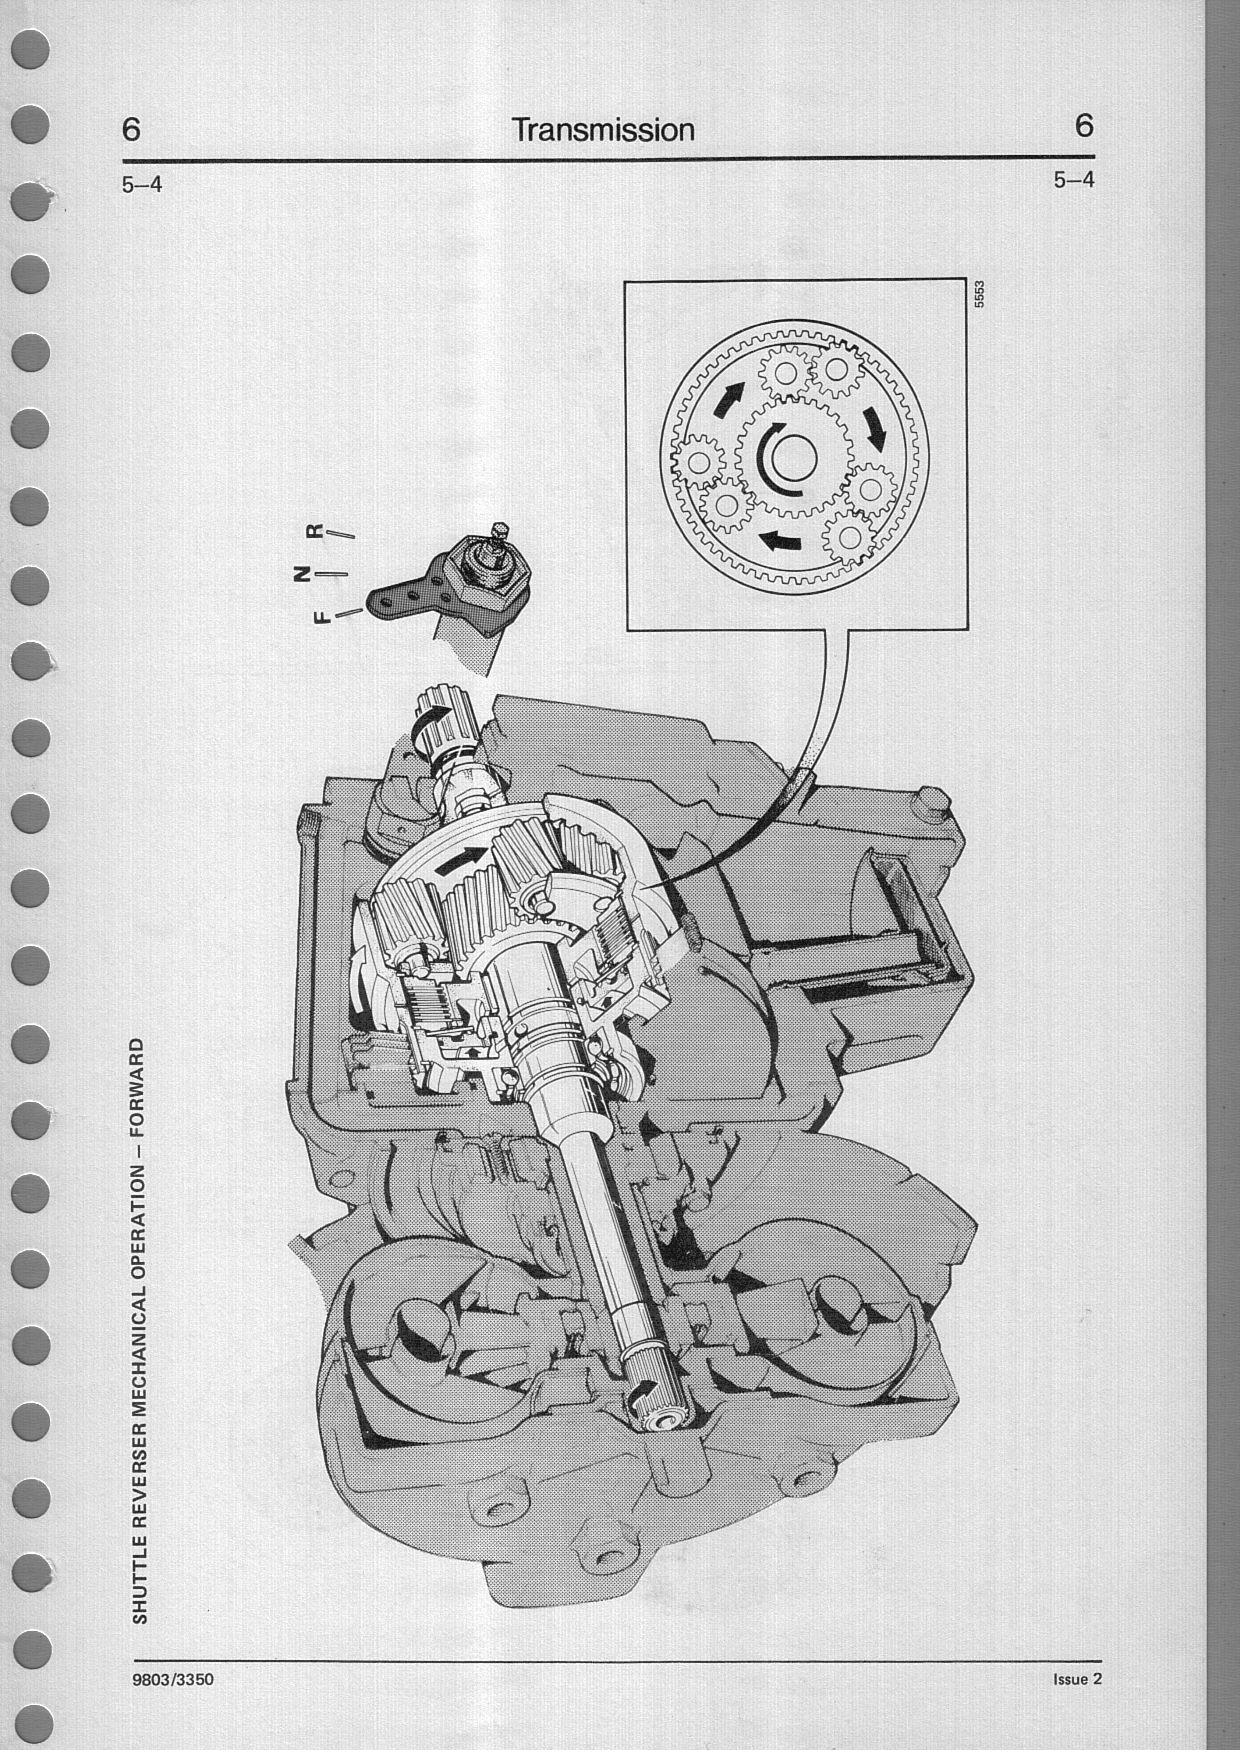 1987 JCB 1400B backhoe-automatic transmission problem